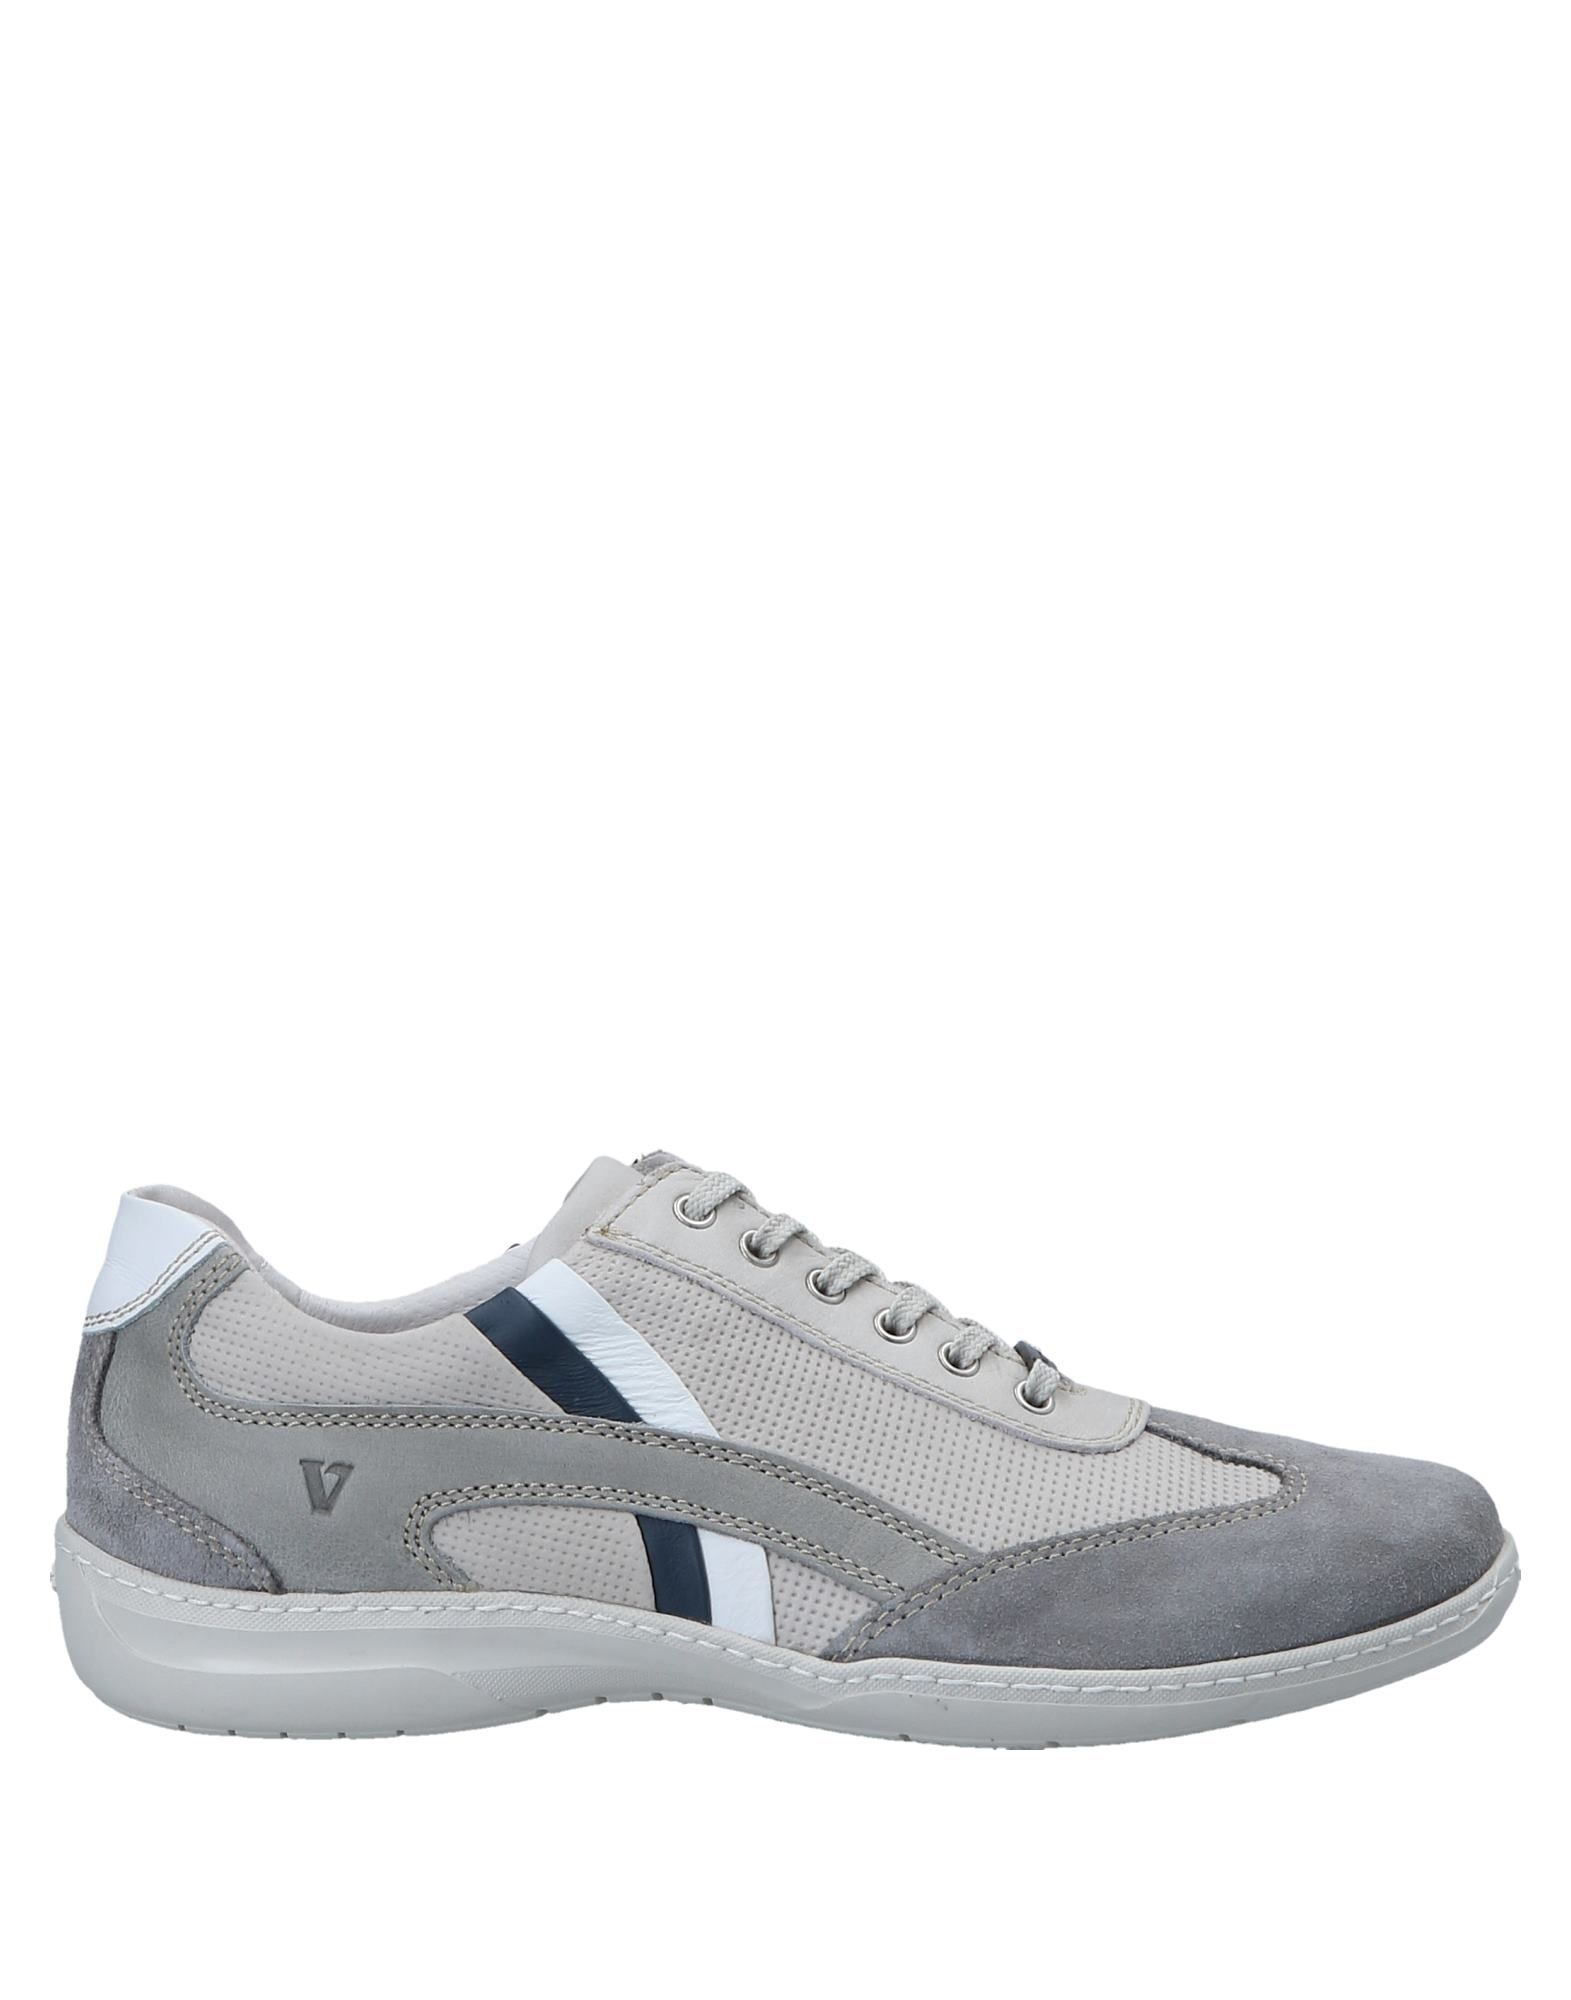 Valleverde Valleverde Valleverde Sneakers - Men Valleverde Sneakers online on  United Kingdom - 11555832JD 1361cb